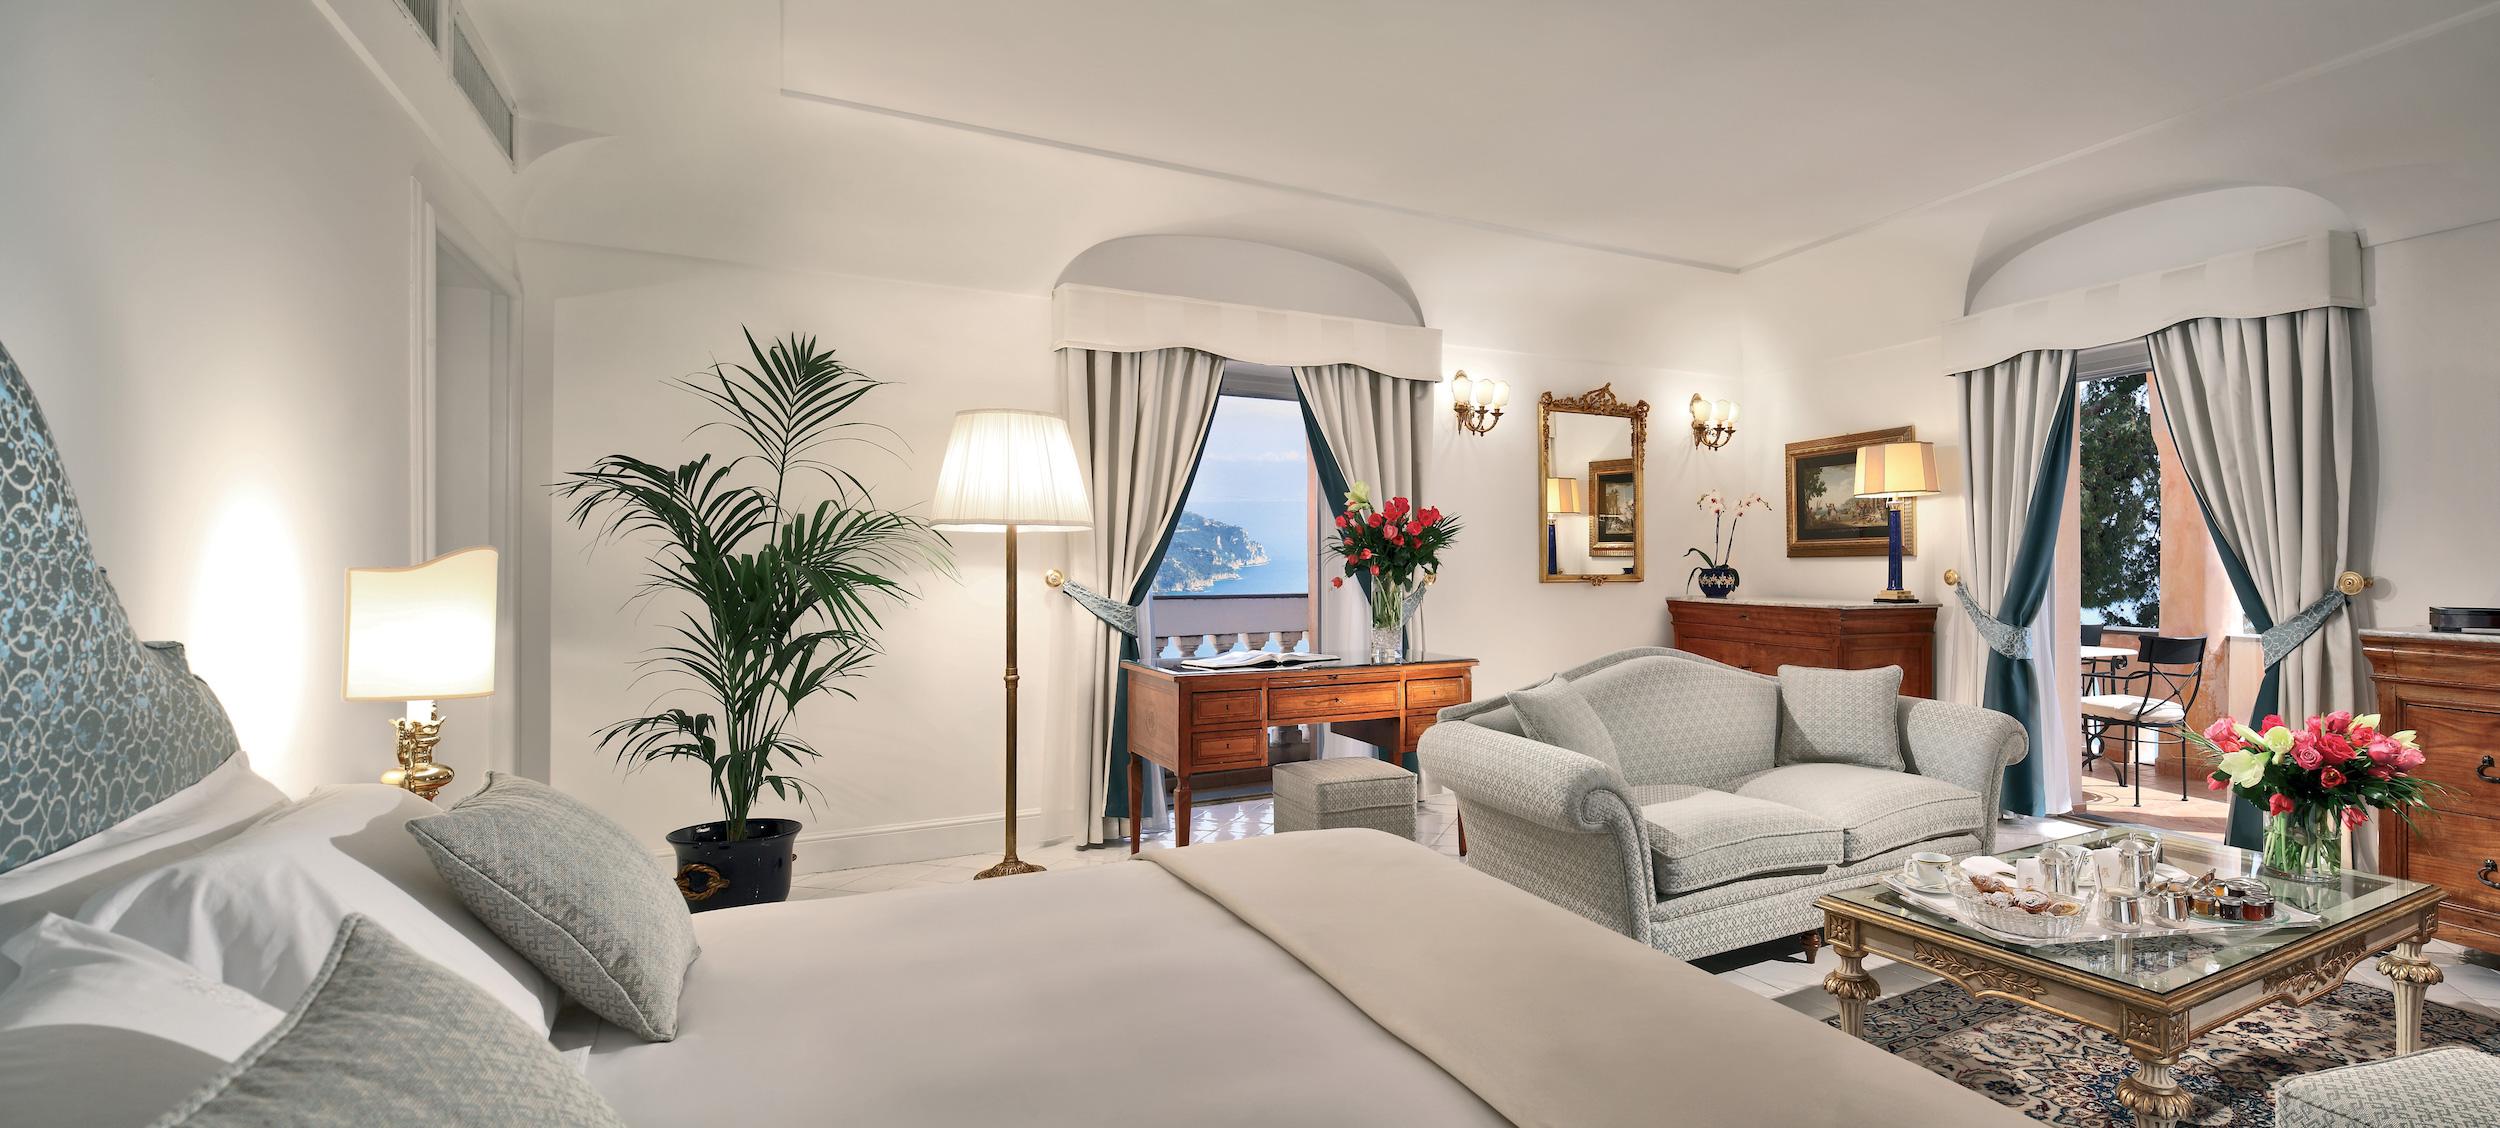 palazzo-avino-deluxe-suite-with-terrace.jpg